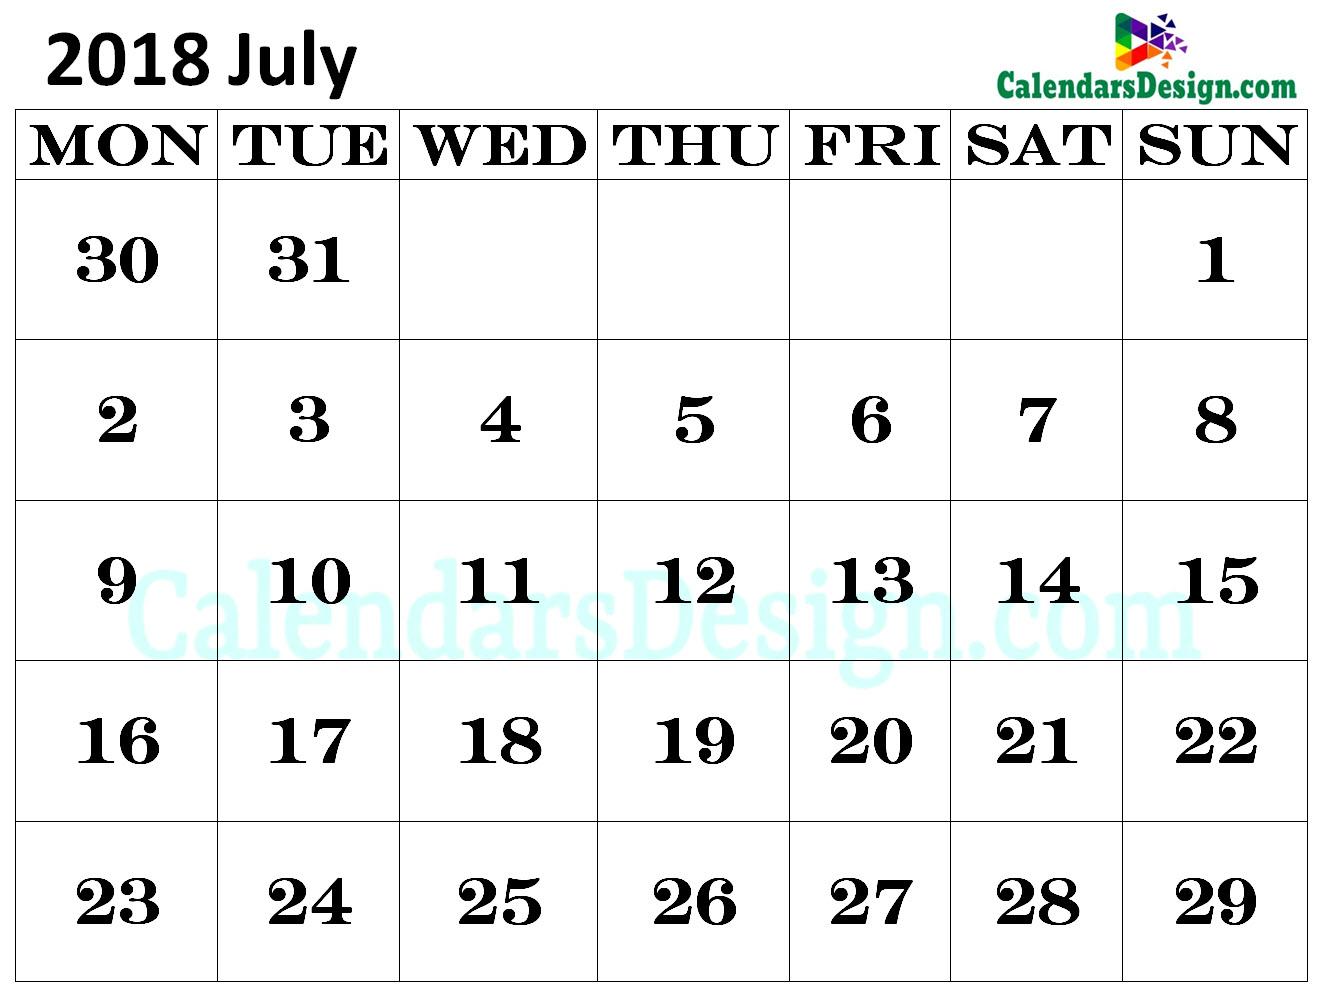 Calendar for July 2018 in Excel